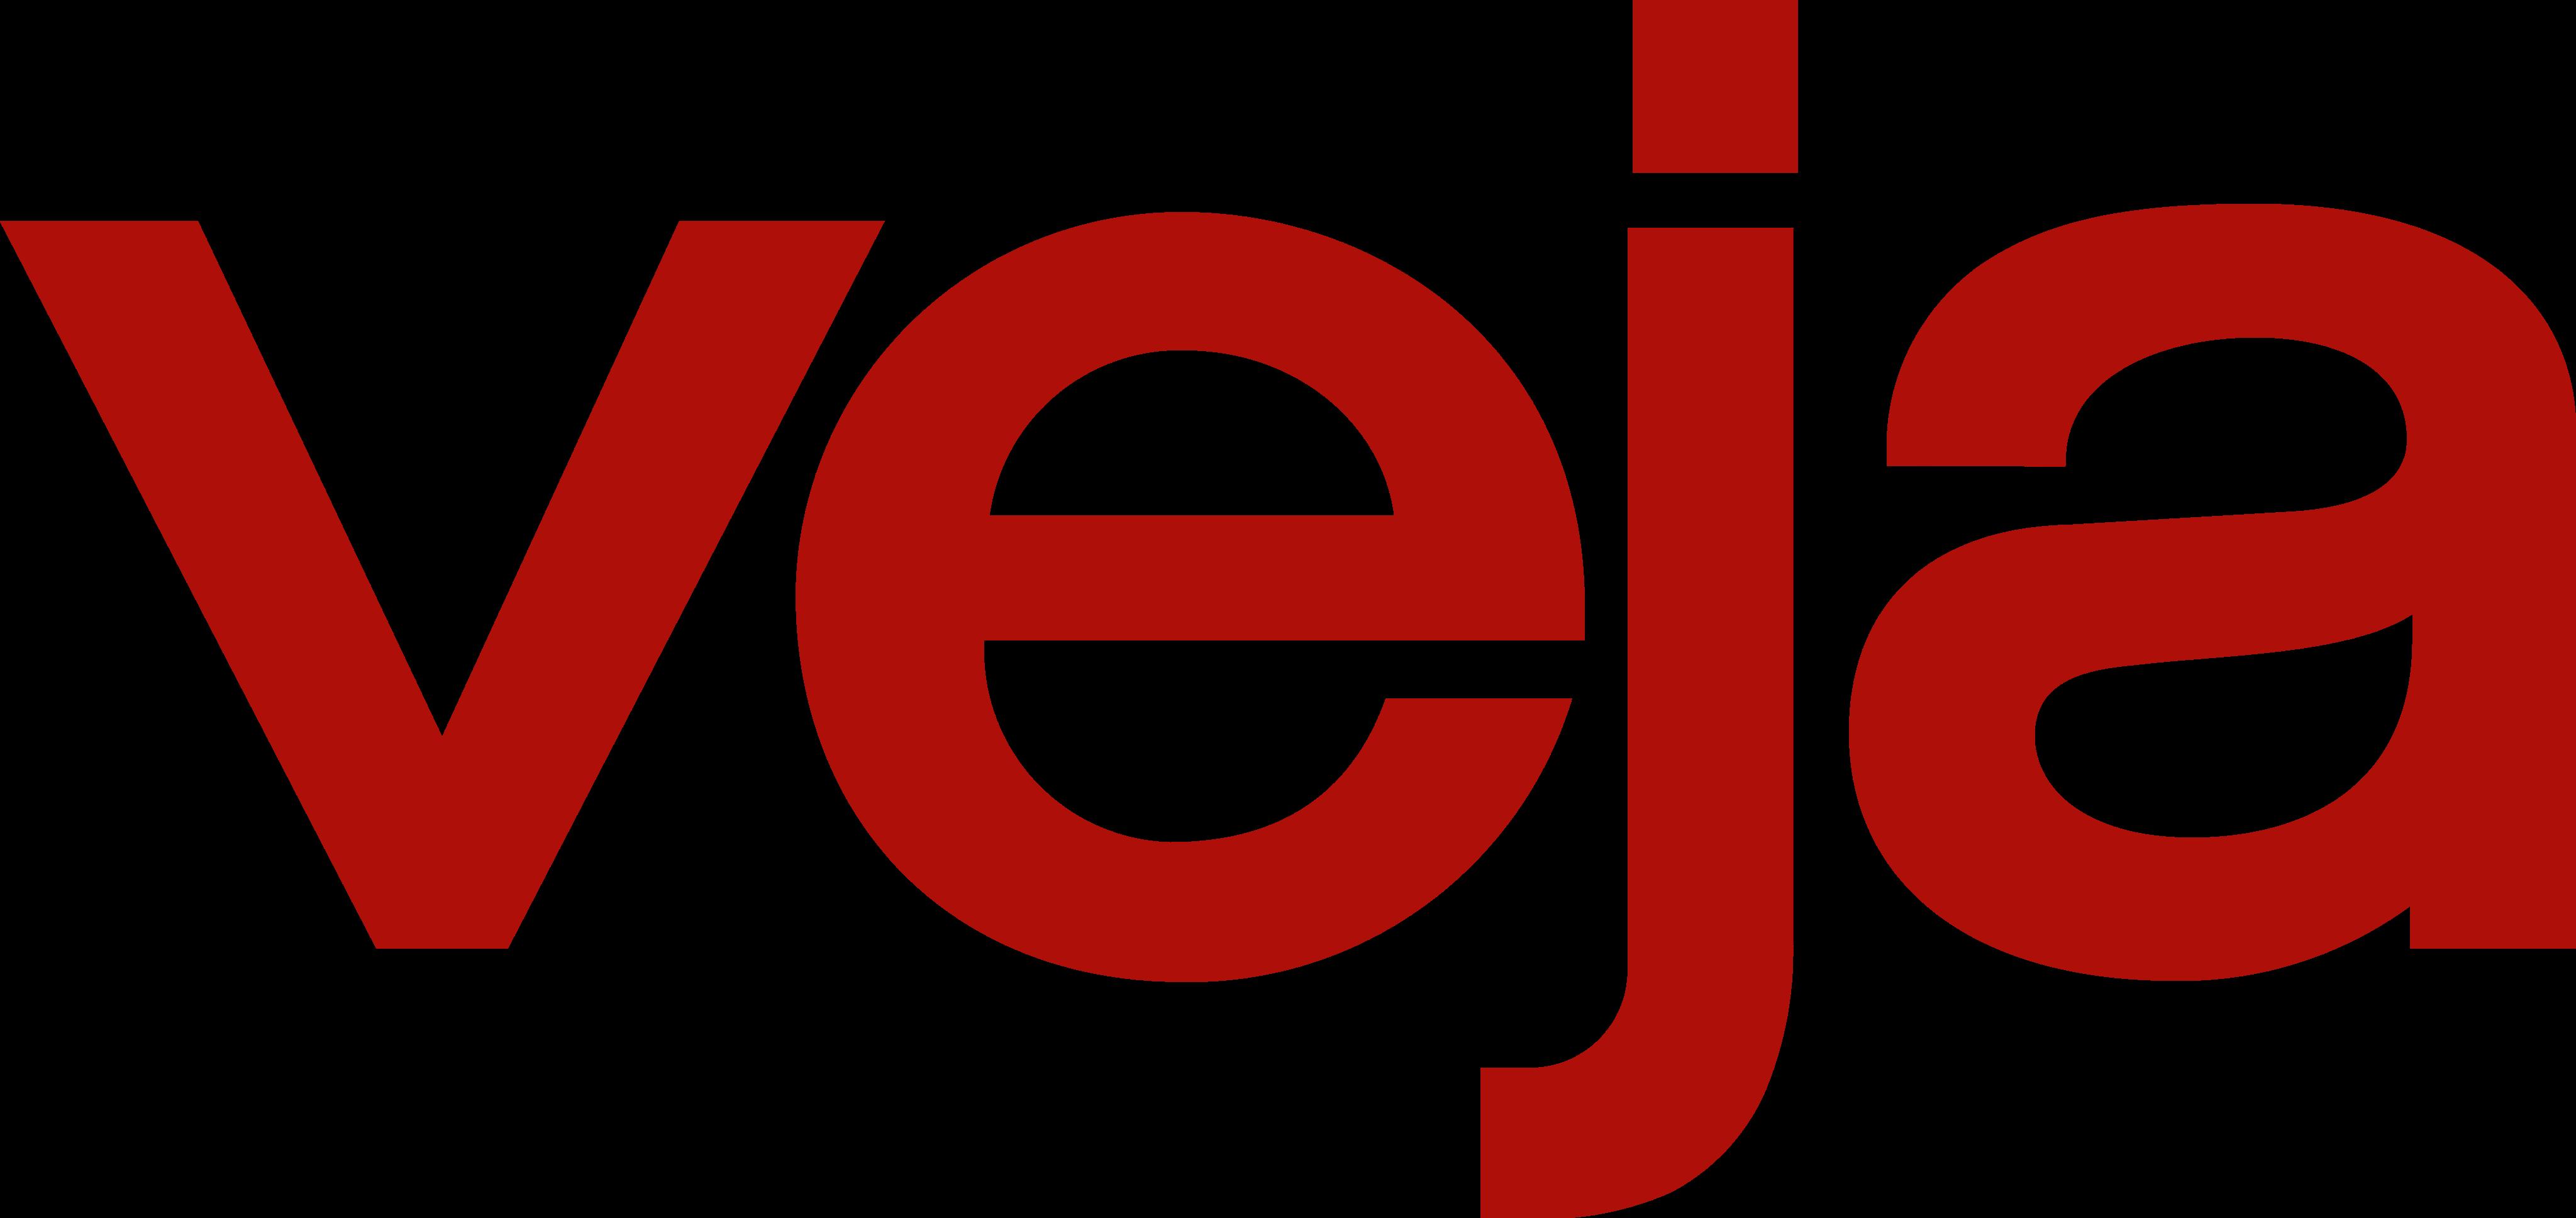 Veja Logo - PNG e Vetor - Download de Logo